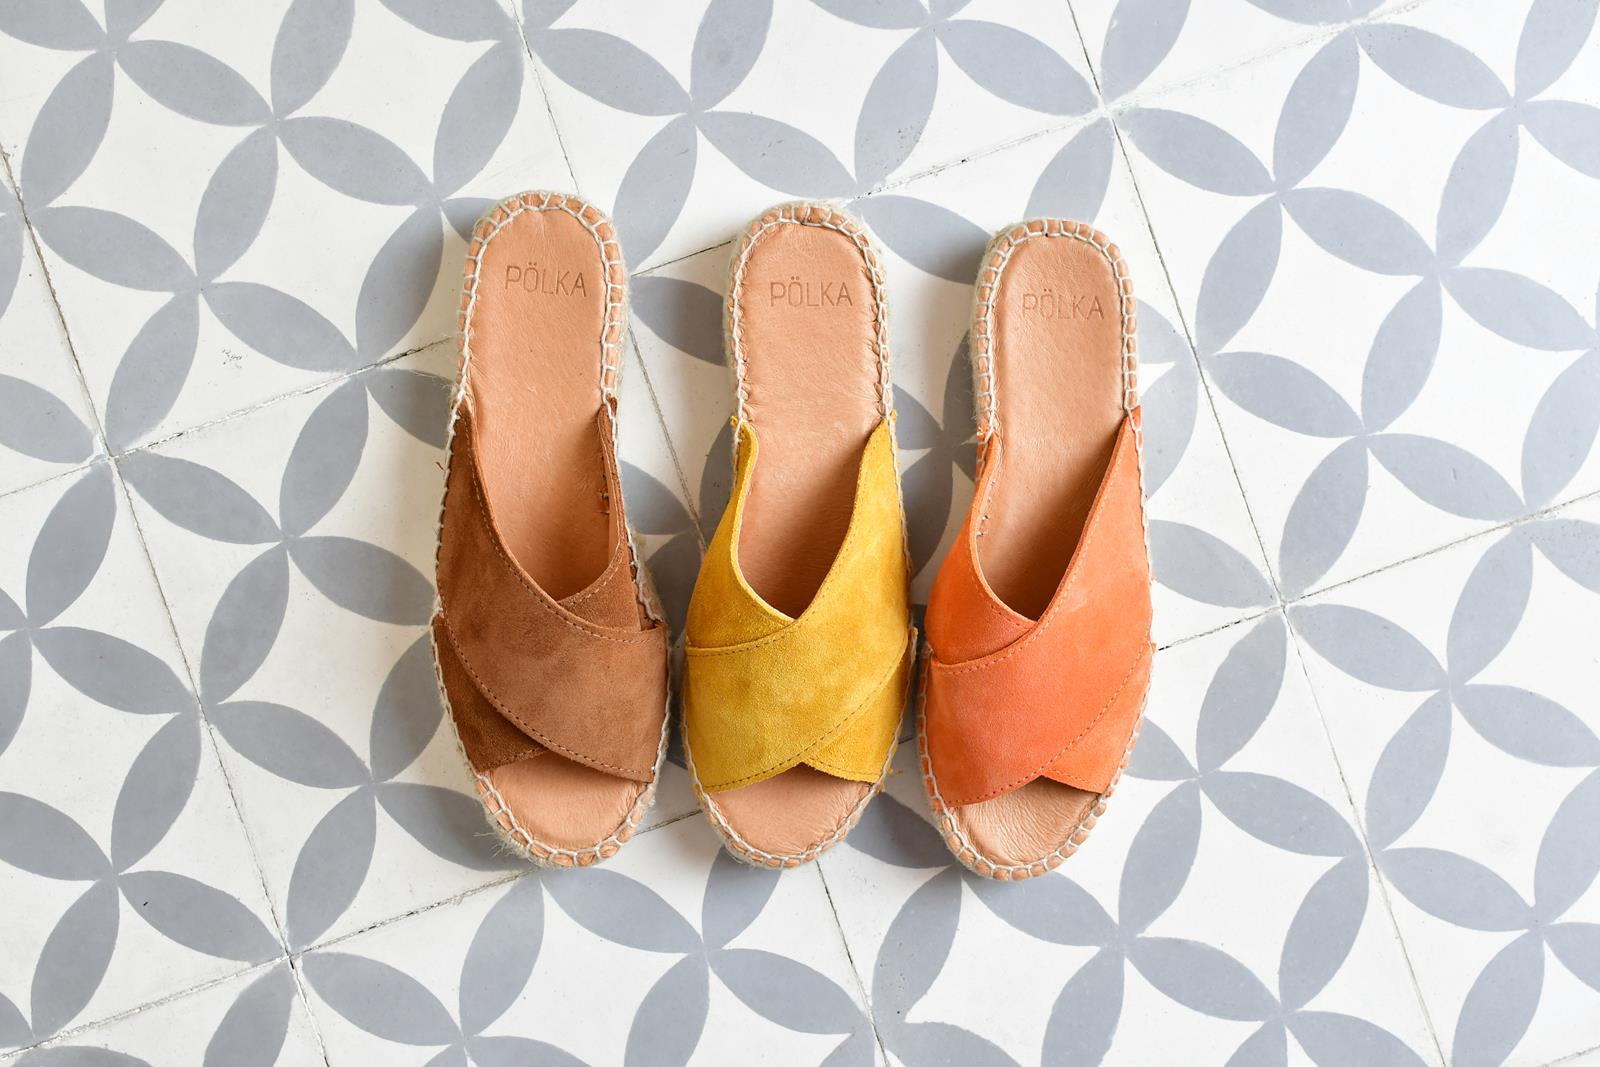 Sandalias MAde in Spain Polka Shoes